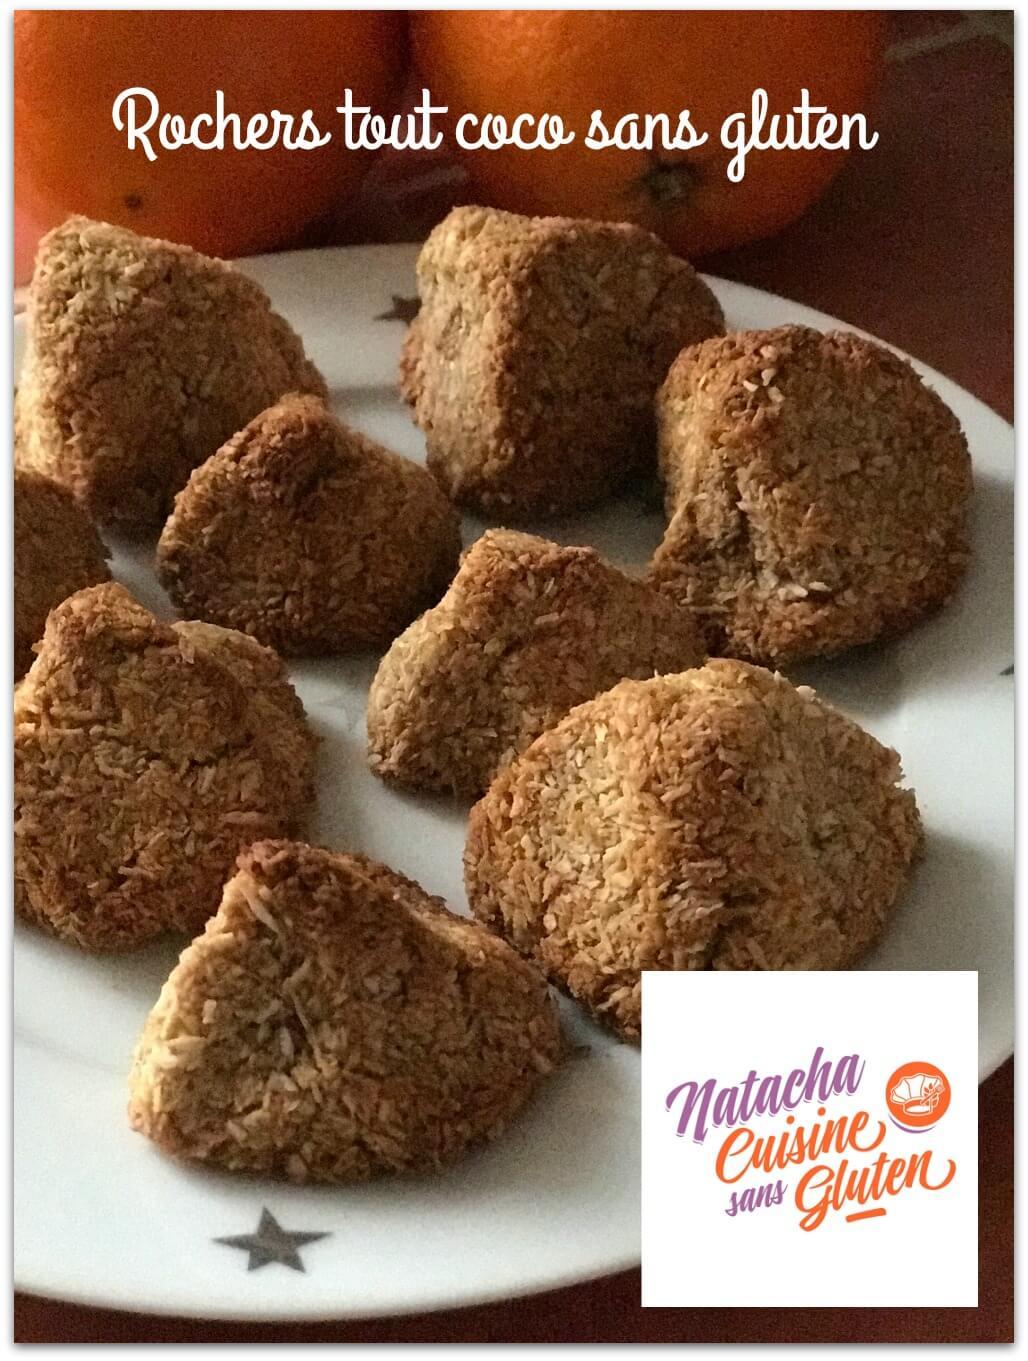 rochers-tout-coco-sans-gluten2